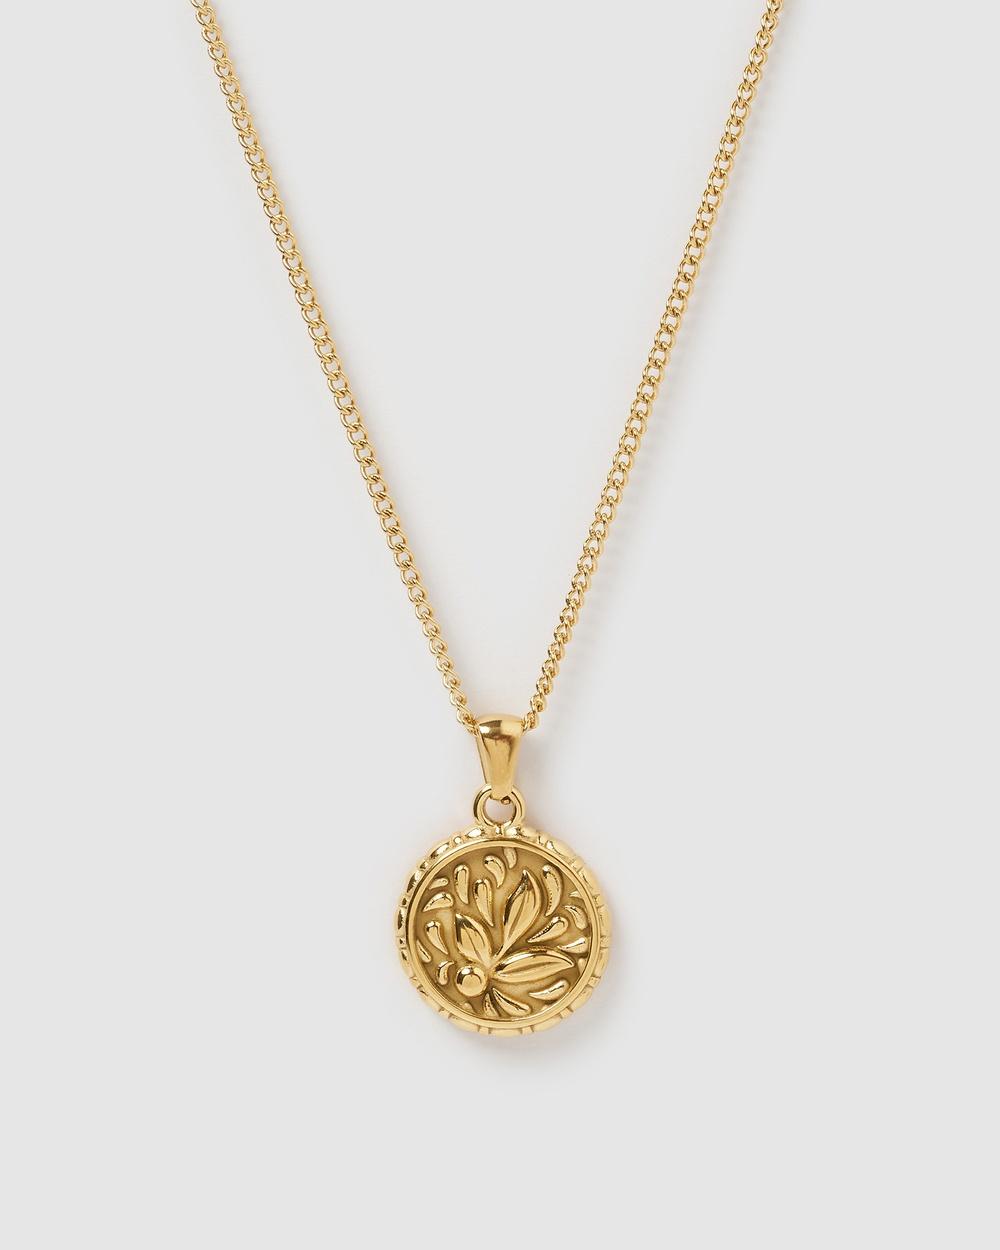 Miz Casa and Co Alicia Pendant Necklace Jewellery Gold